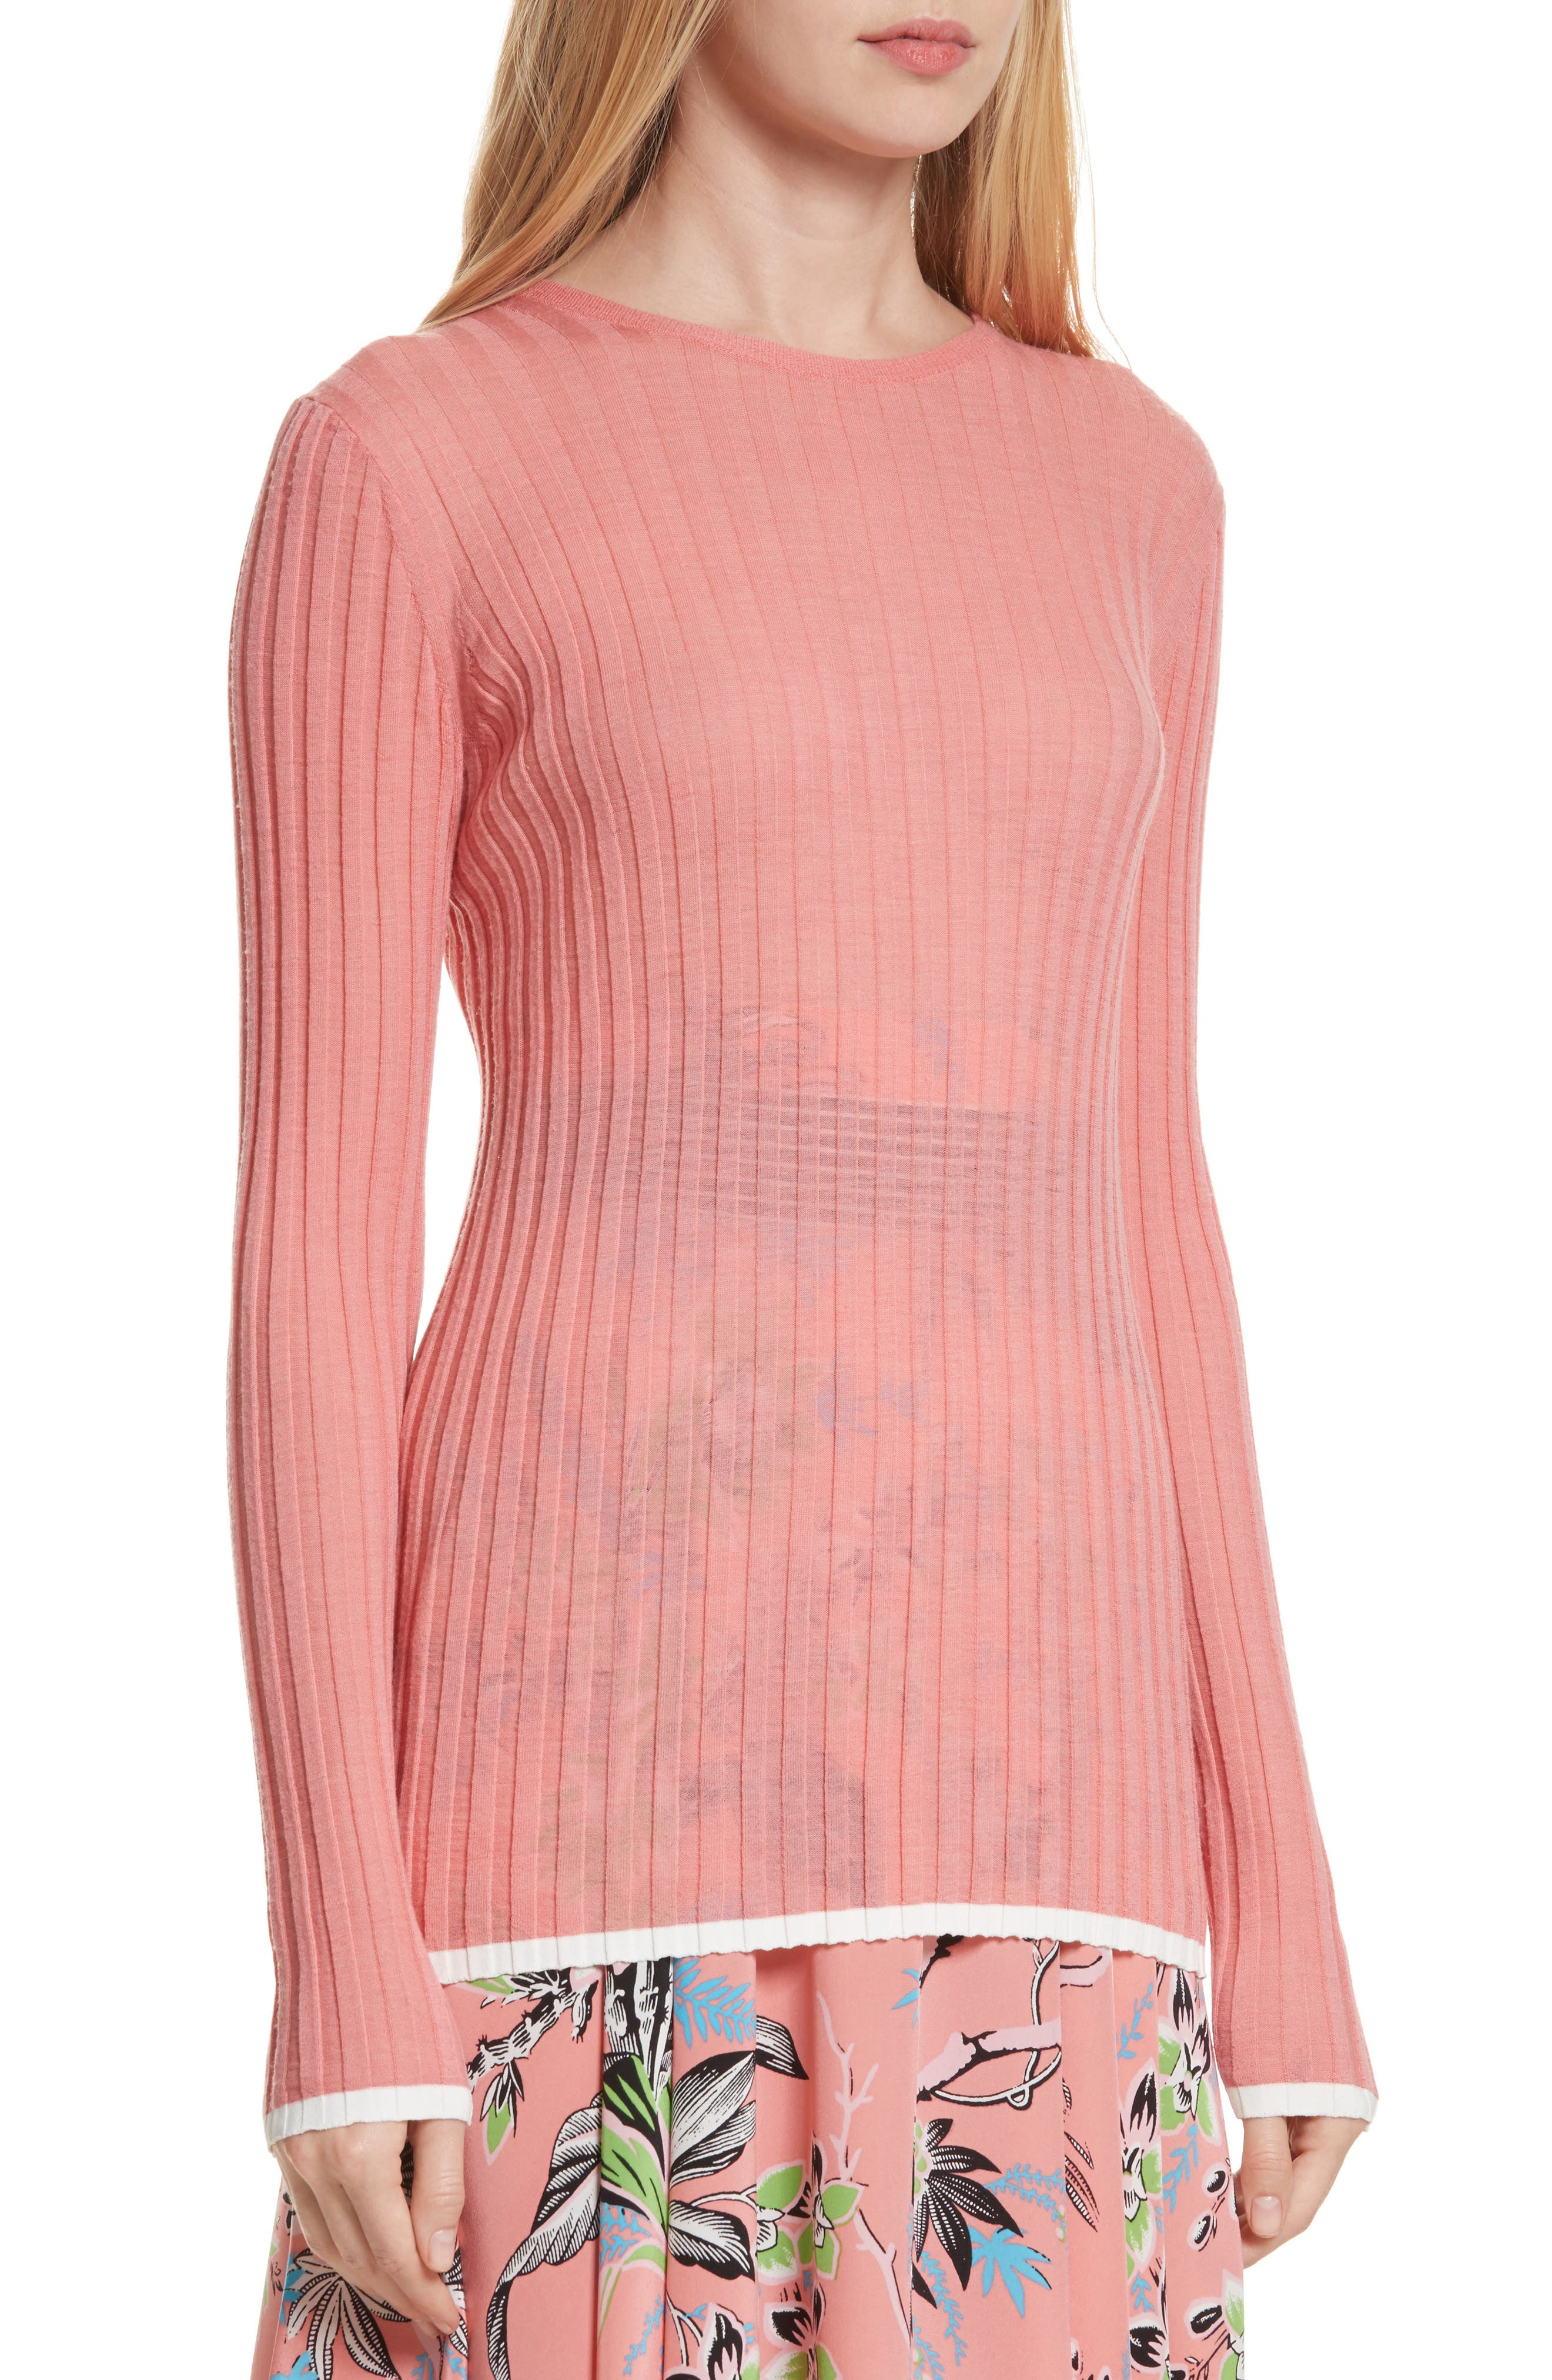 Diane von Furstenberg Ribbed Sweater,                             Alternate thumbnail 4, color,                             670